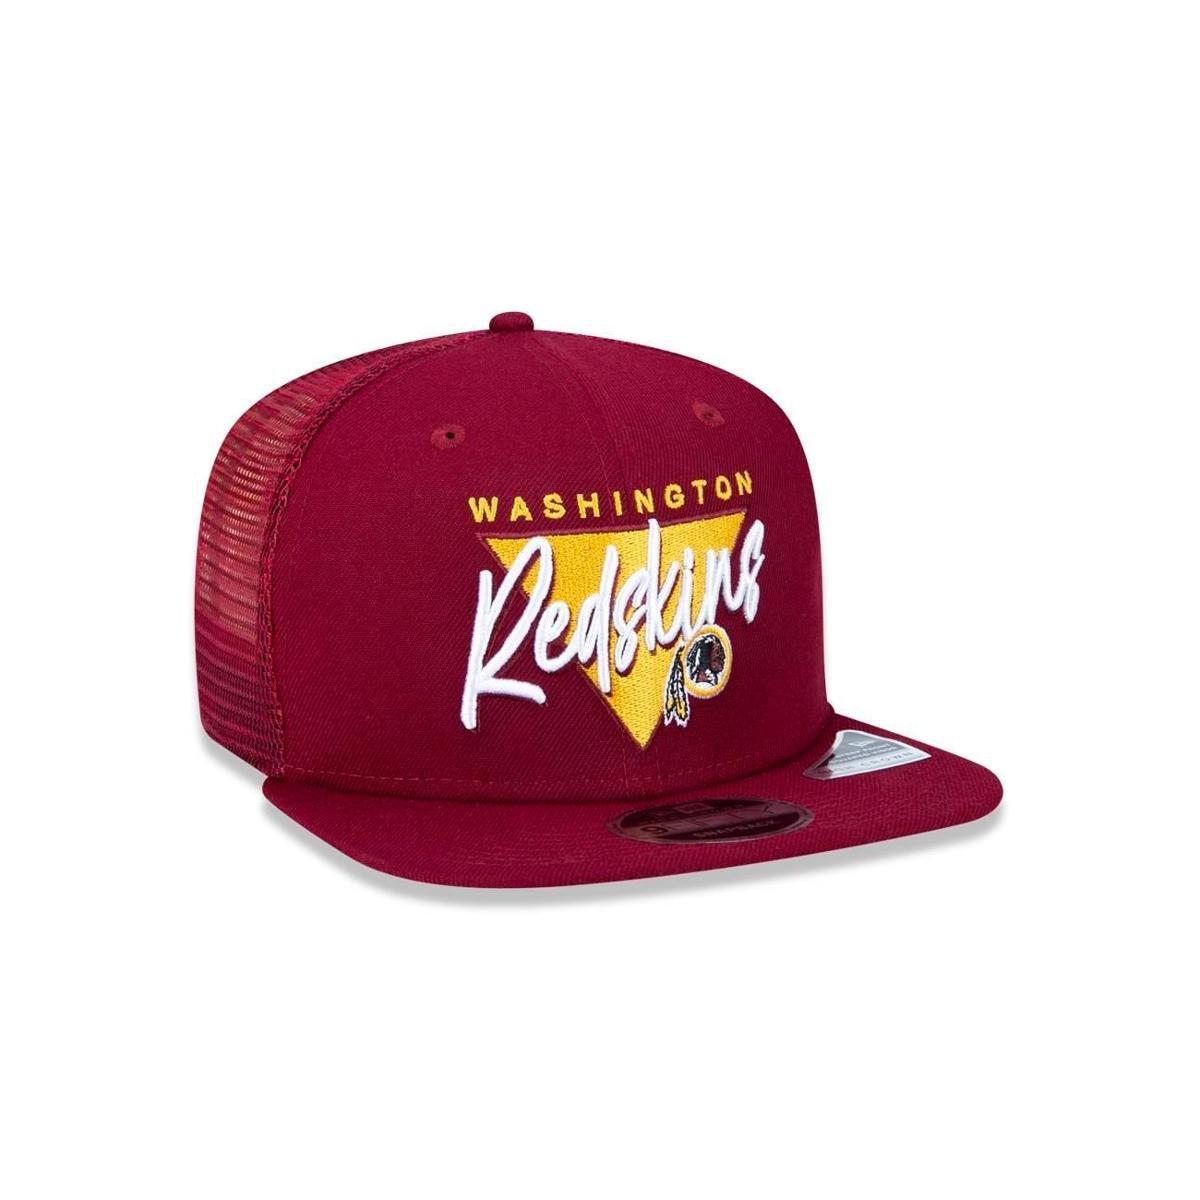 Boné Trucker Washington Redskins NFL Aba Reta New Era - Compre Agora ... f9aa9364cb3